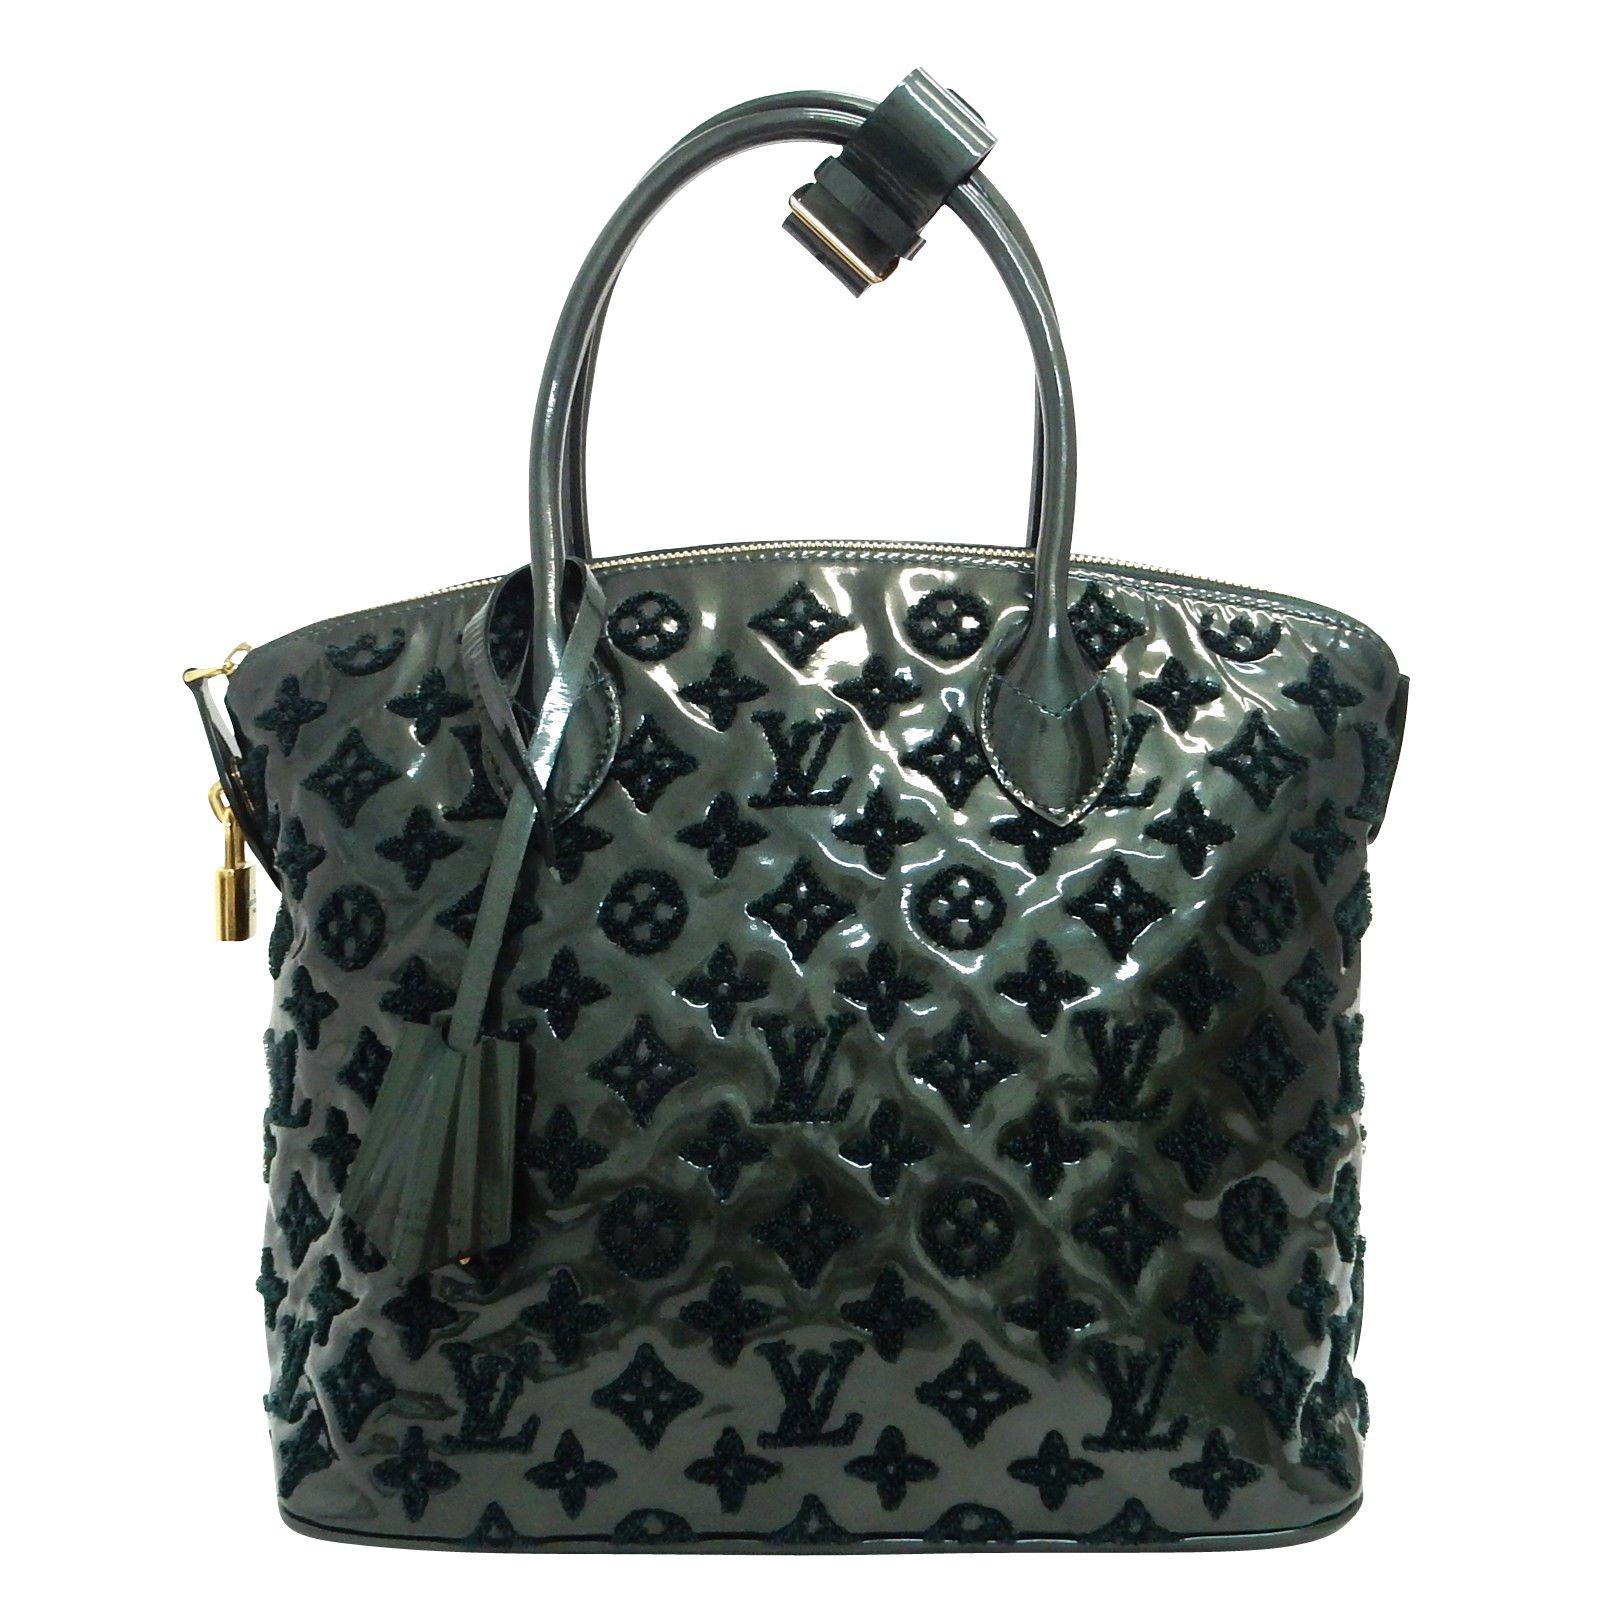 Louis Vuitton Fascination Lockit Handbags Cloth Green ref.86768 ... 040d2de4c5085